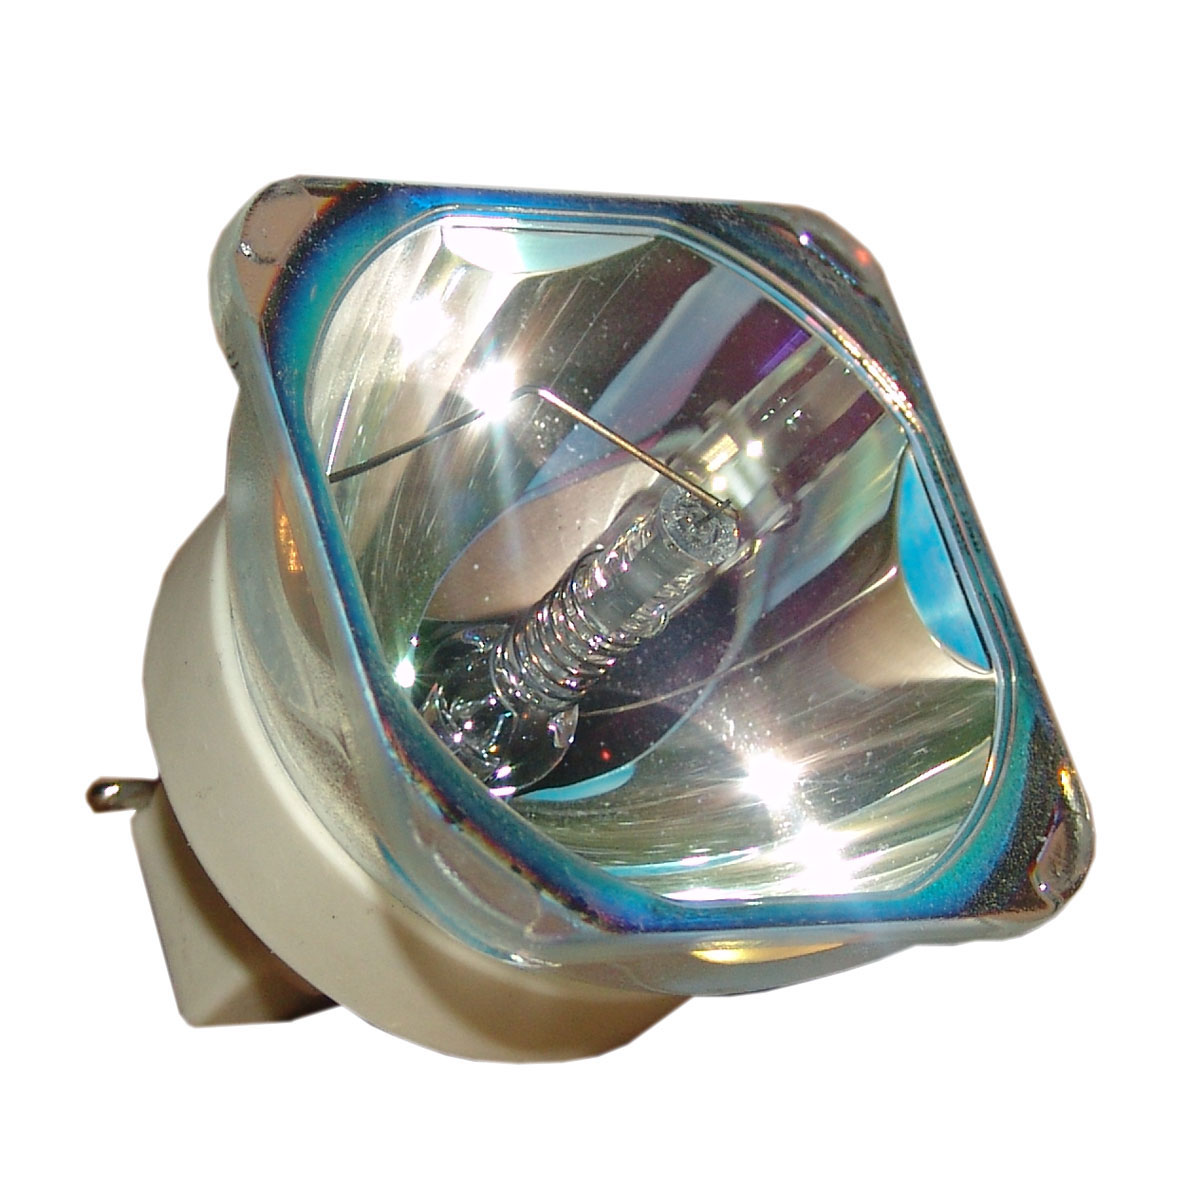 Lutema Platinum for Panasonic PT-EX600 Projector Lamp (Original Philips Bulb) - image 3 de 5